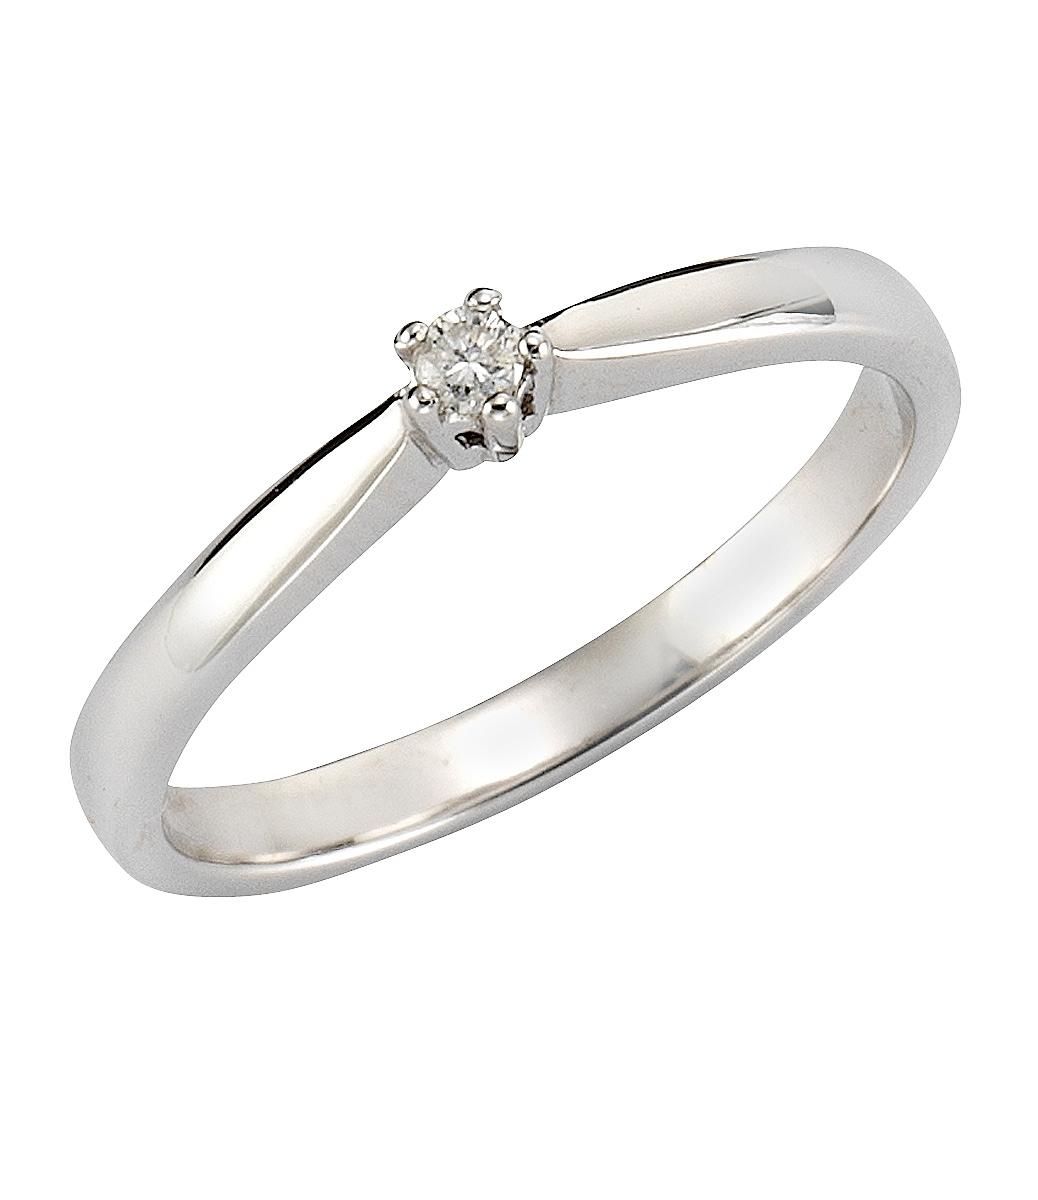 Firetti zilveren ring Verlovingsring/stapelring - gratis ruilen op otto.nl